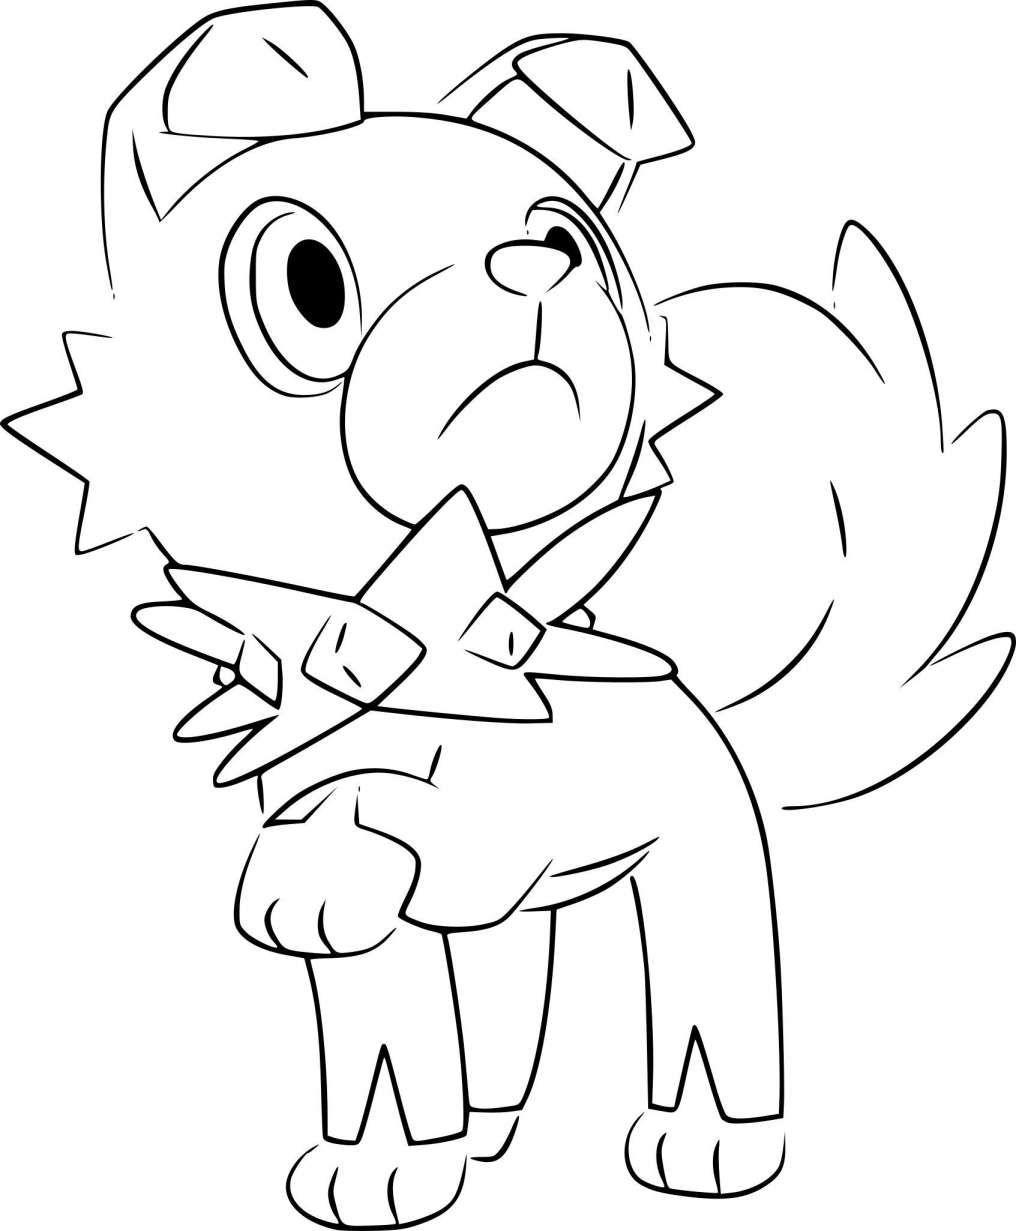 9 Rockruff Coloring Page Ausmalbilder Pokemon Ausmalbilder Ausmalbilder Kinder